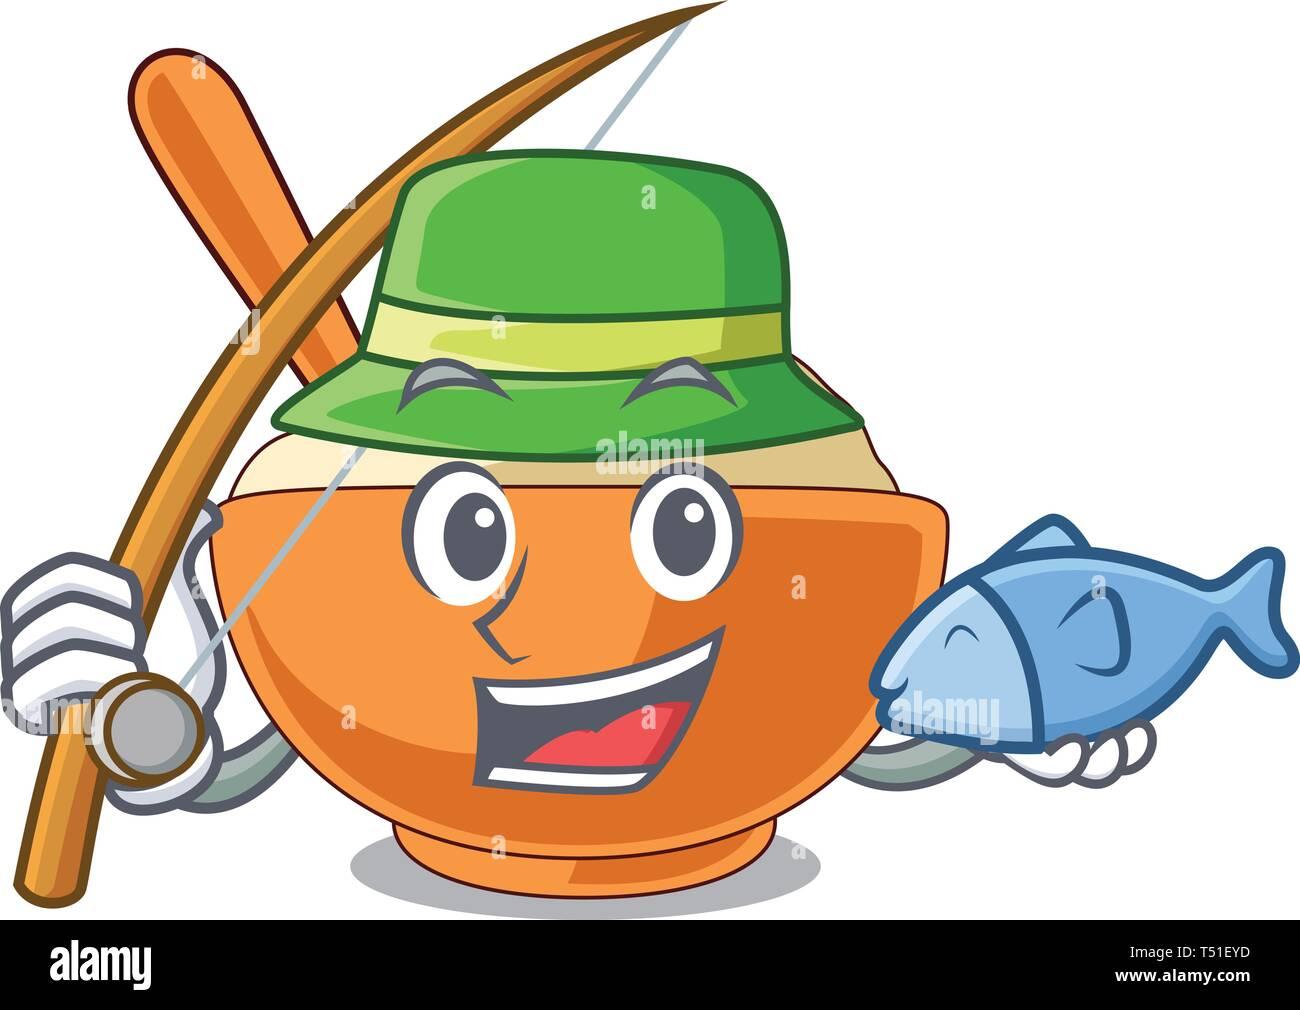 Fishing mashed potato in the shape mascot - Stock Vector